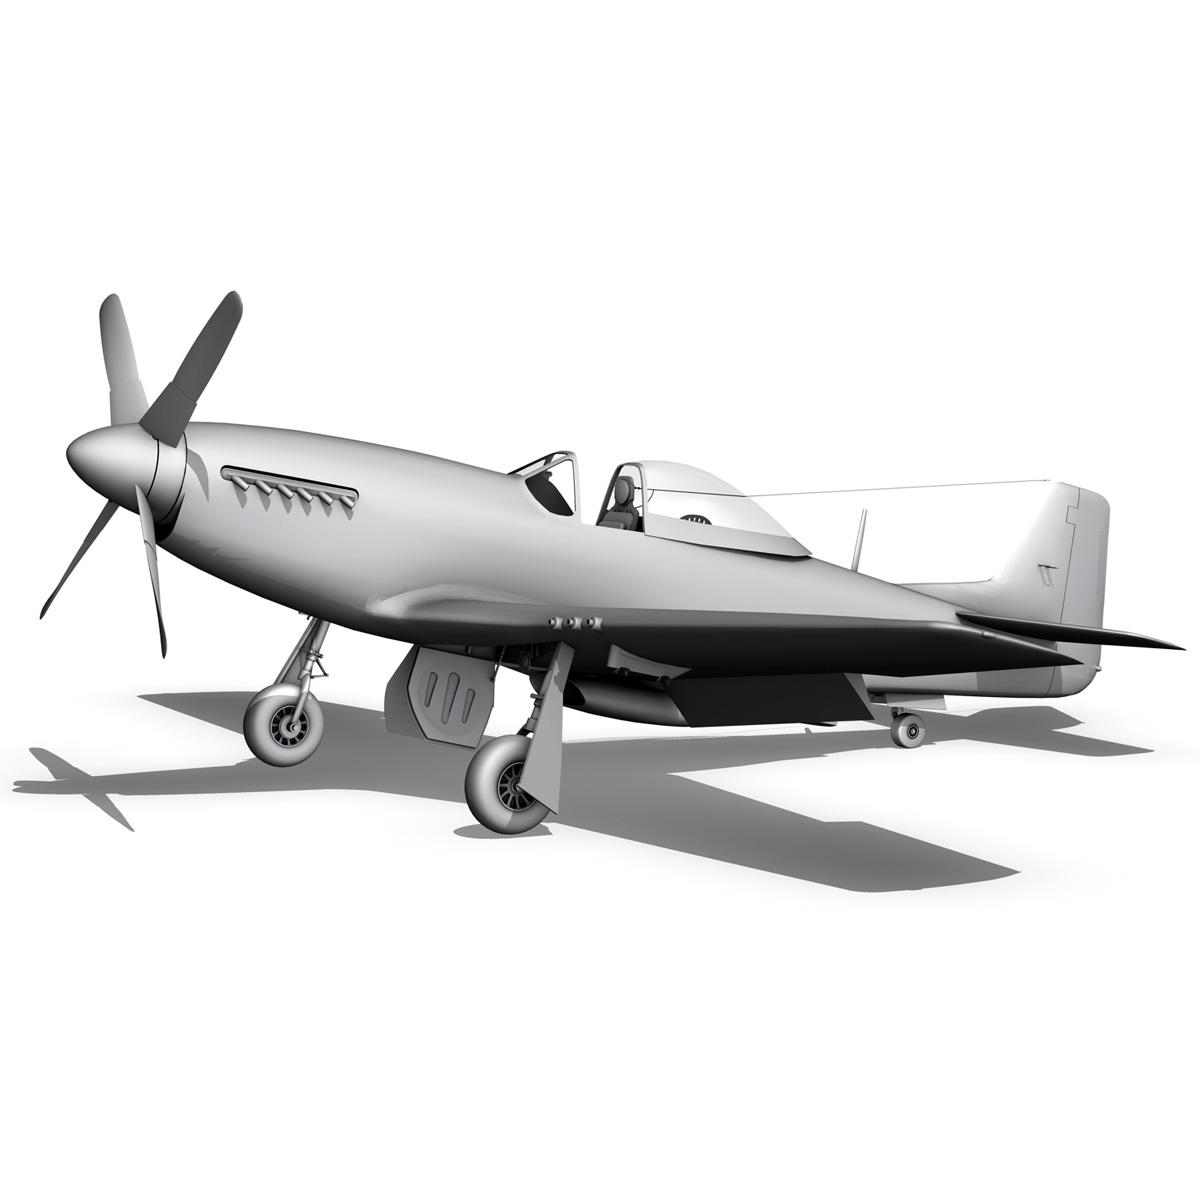 north american p-51d mustang – swedisch airforce 3d model fbx c4d lwo obj 268245